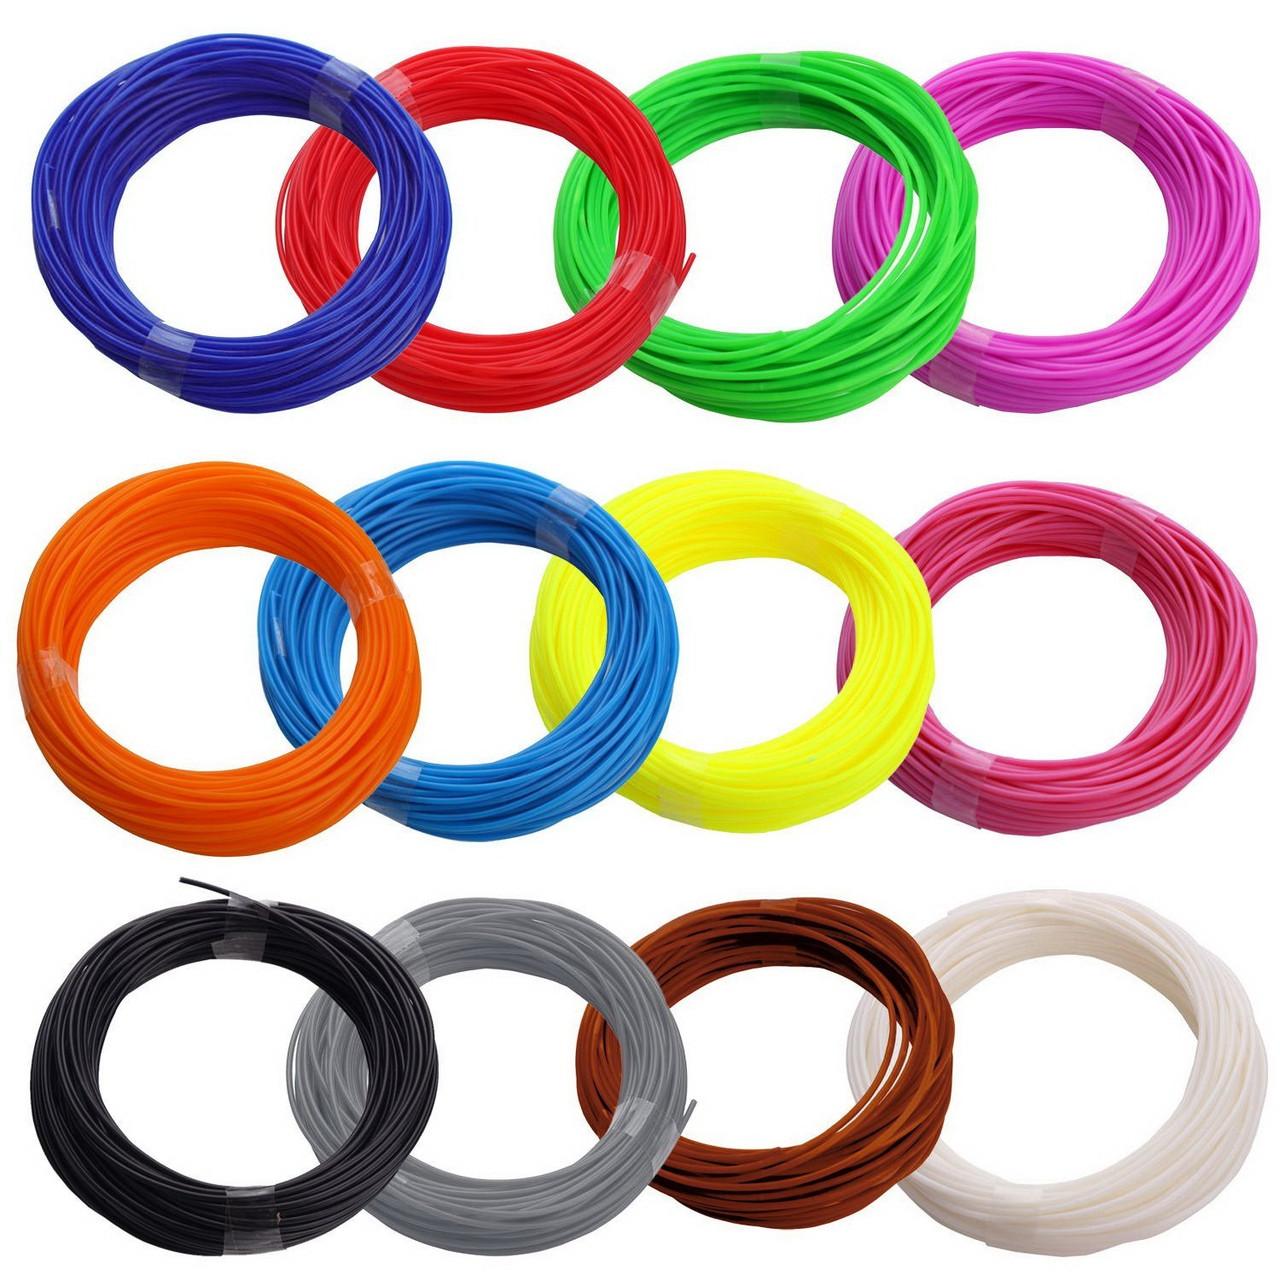 Набор пластика для 3D ручек 80м  пластика в различных цветах + бонус! - 4м светящегося пластика!